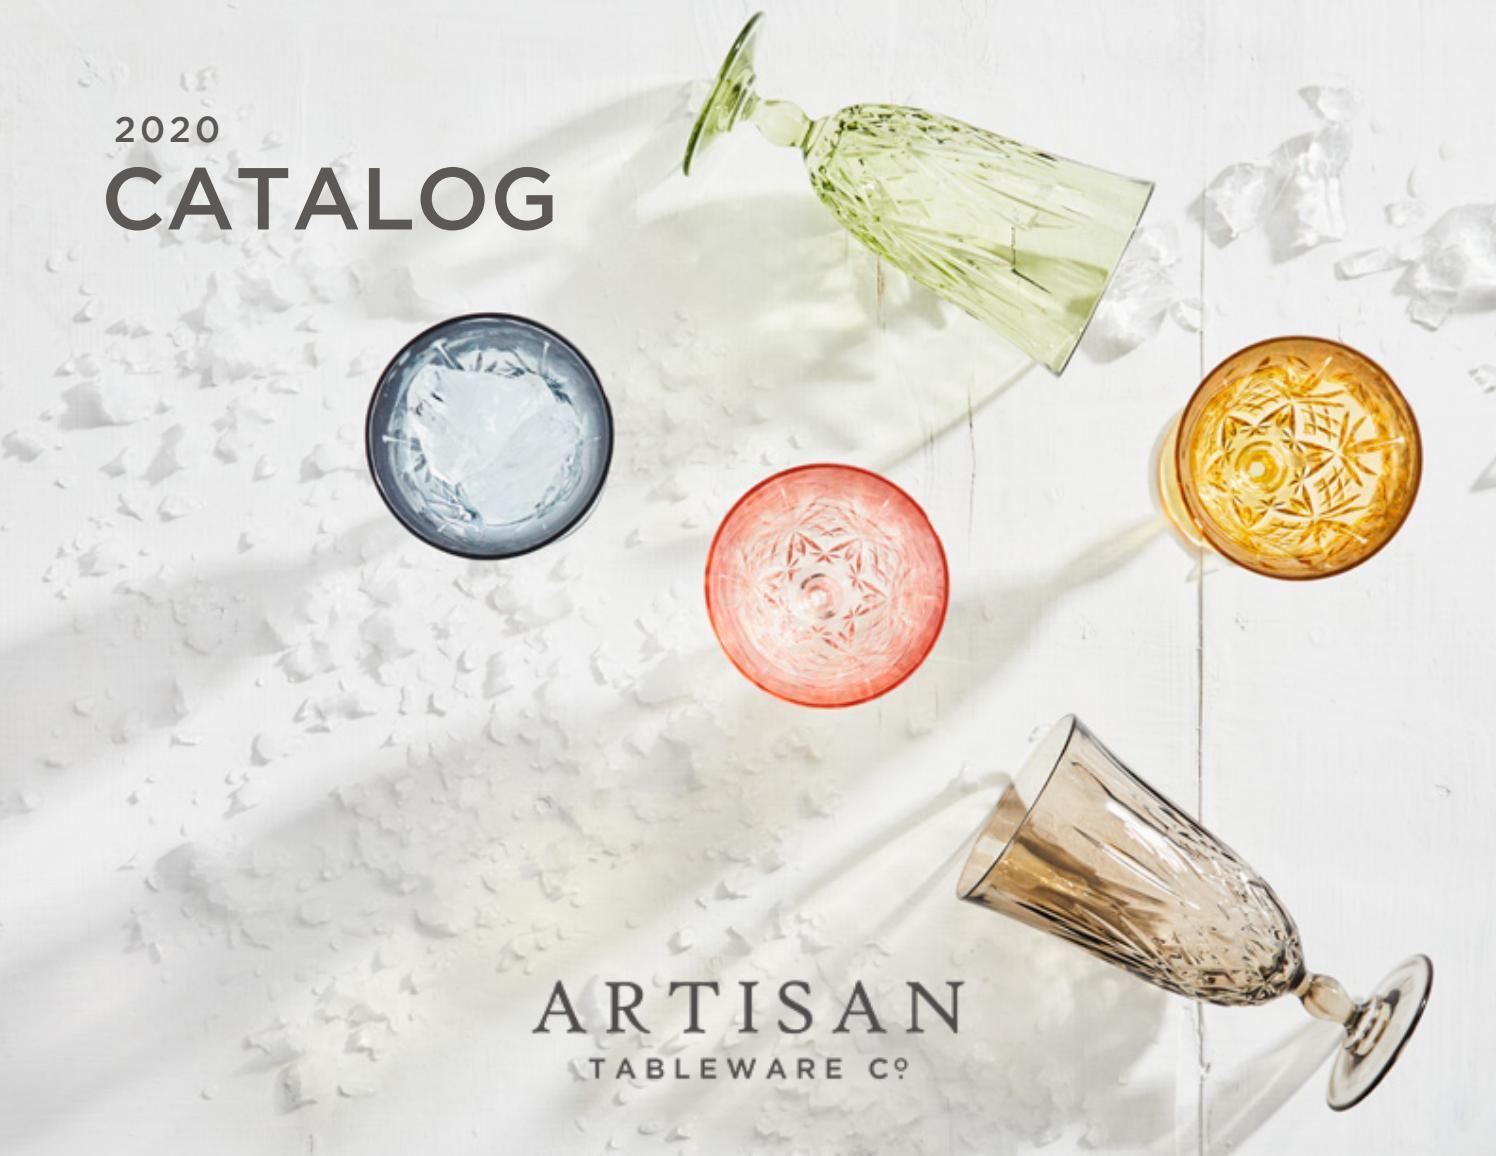 Artisanal Tableware